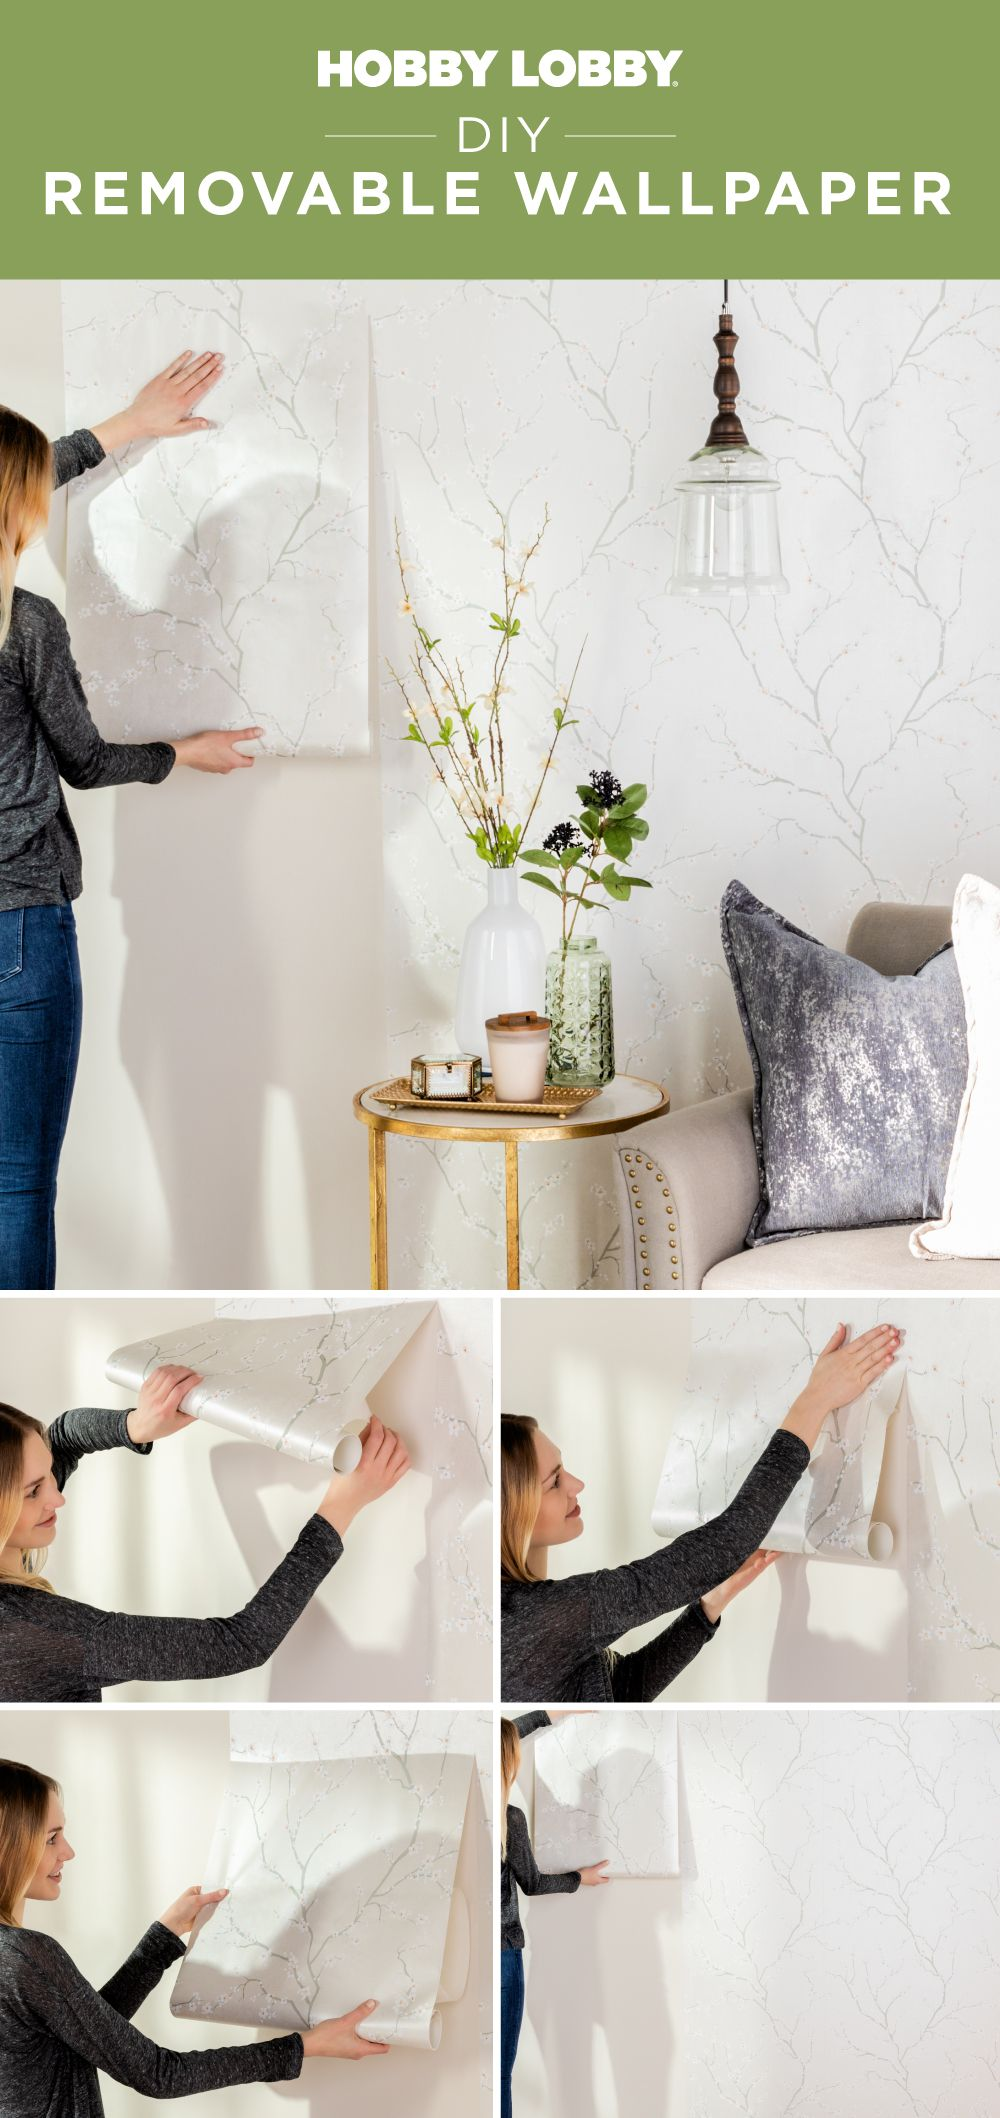 Transform Your Space Into A Personal Oasis With Removable Wallpaper Home Decor Accessories Unique Home Decor Diy Decor